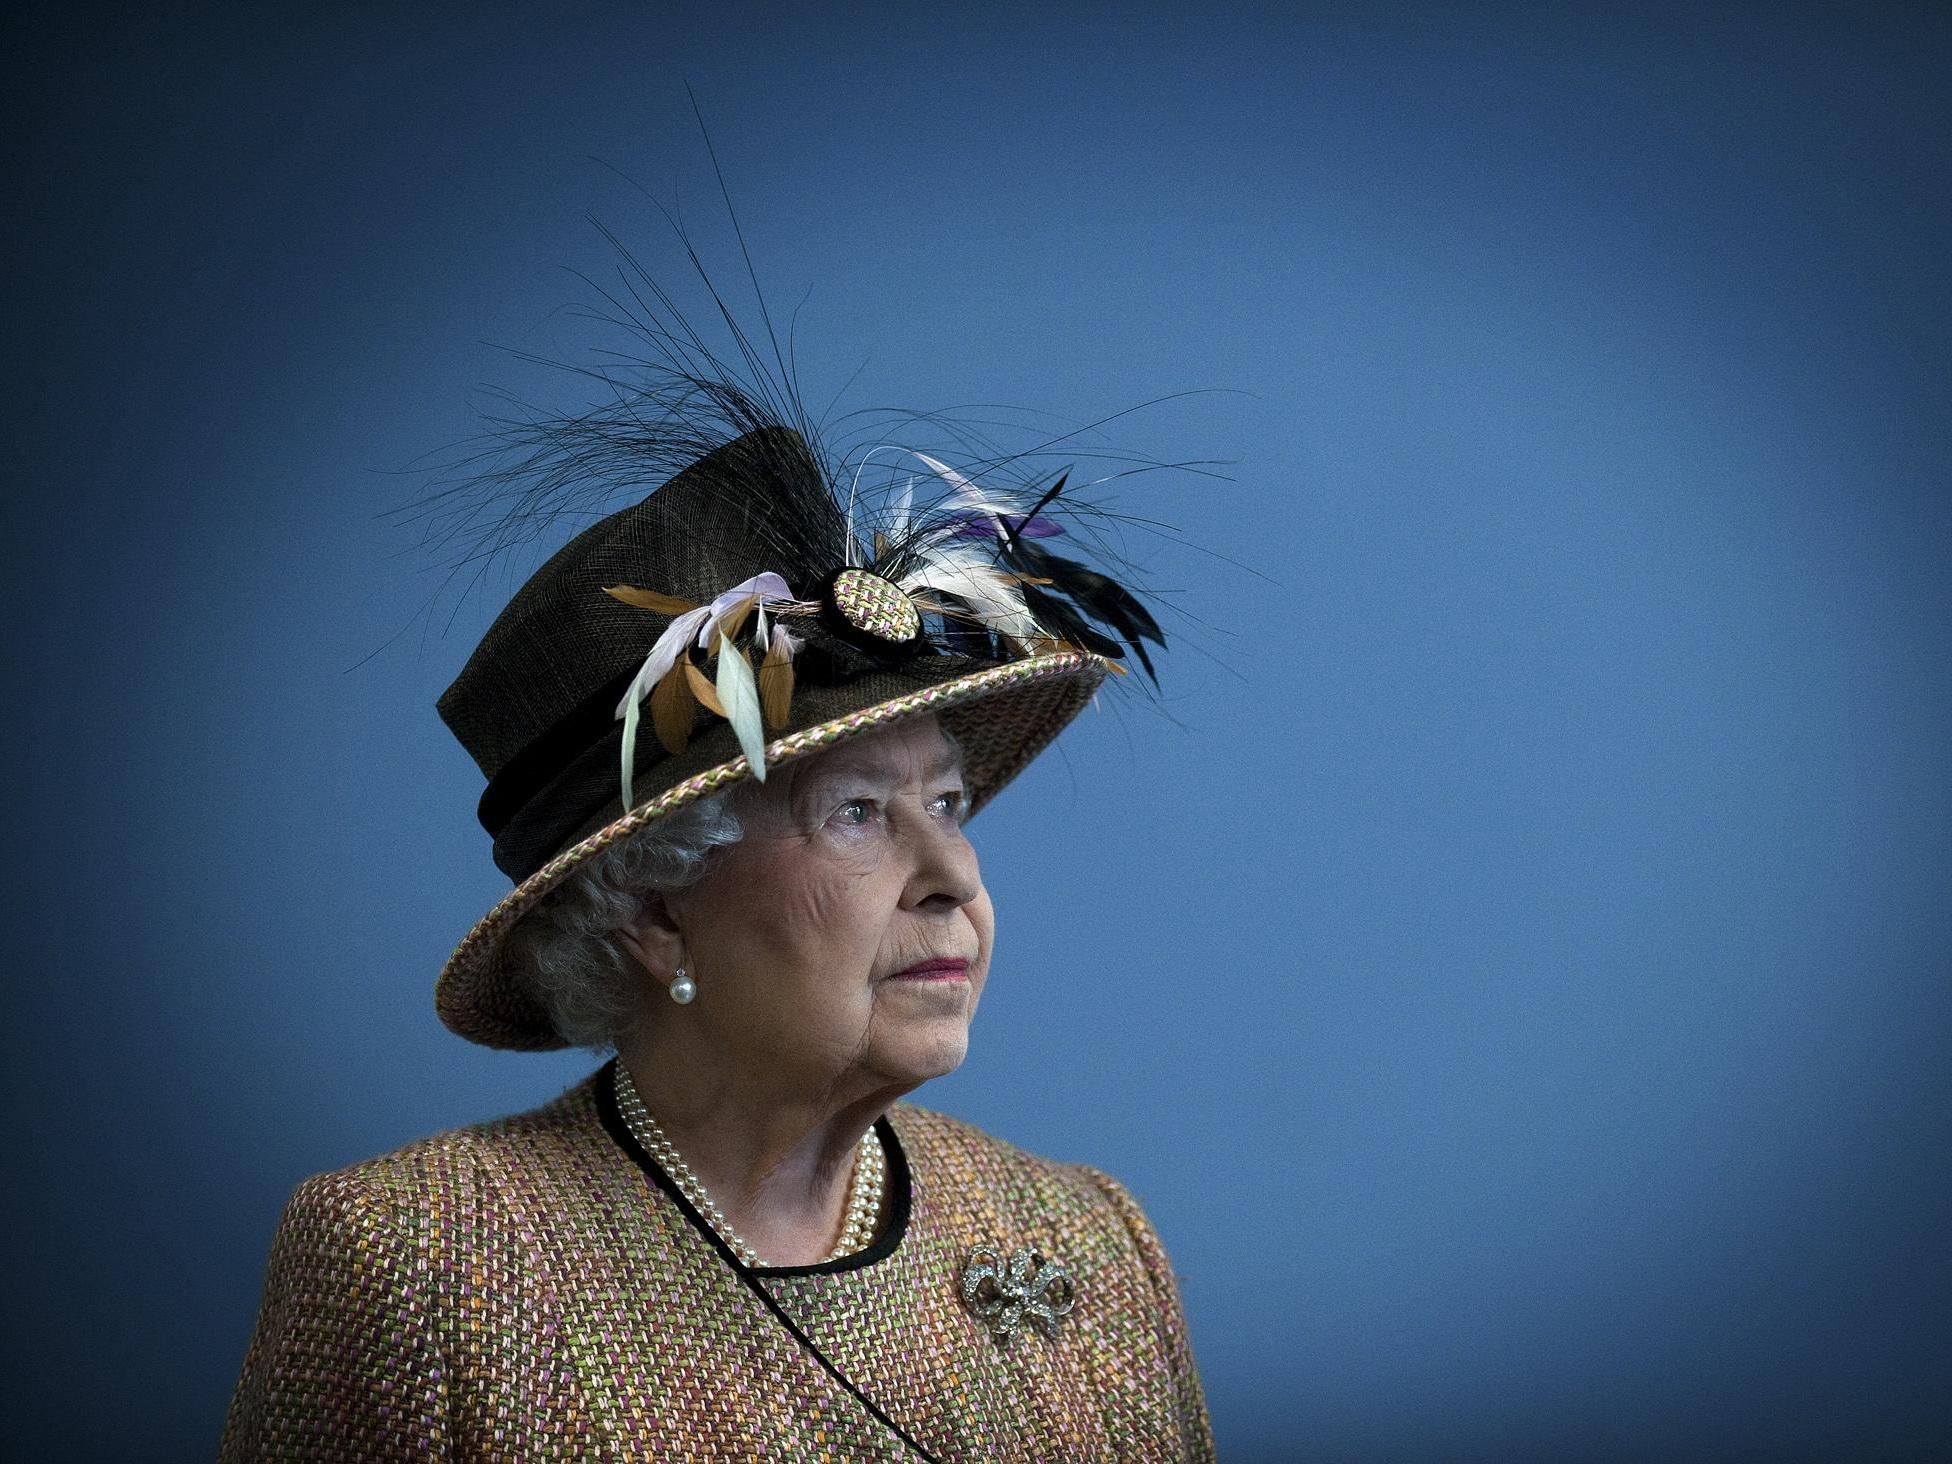 Queen speaks of 'great pride' as UK businesses start to reopen after lockdown